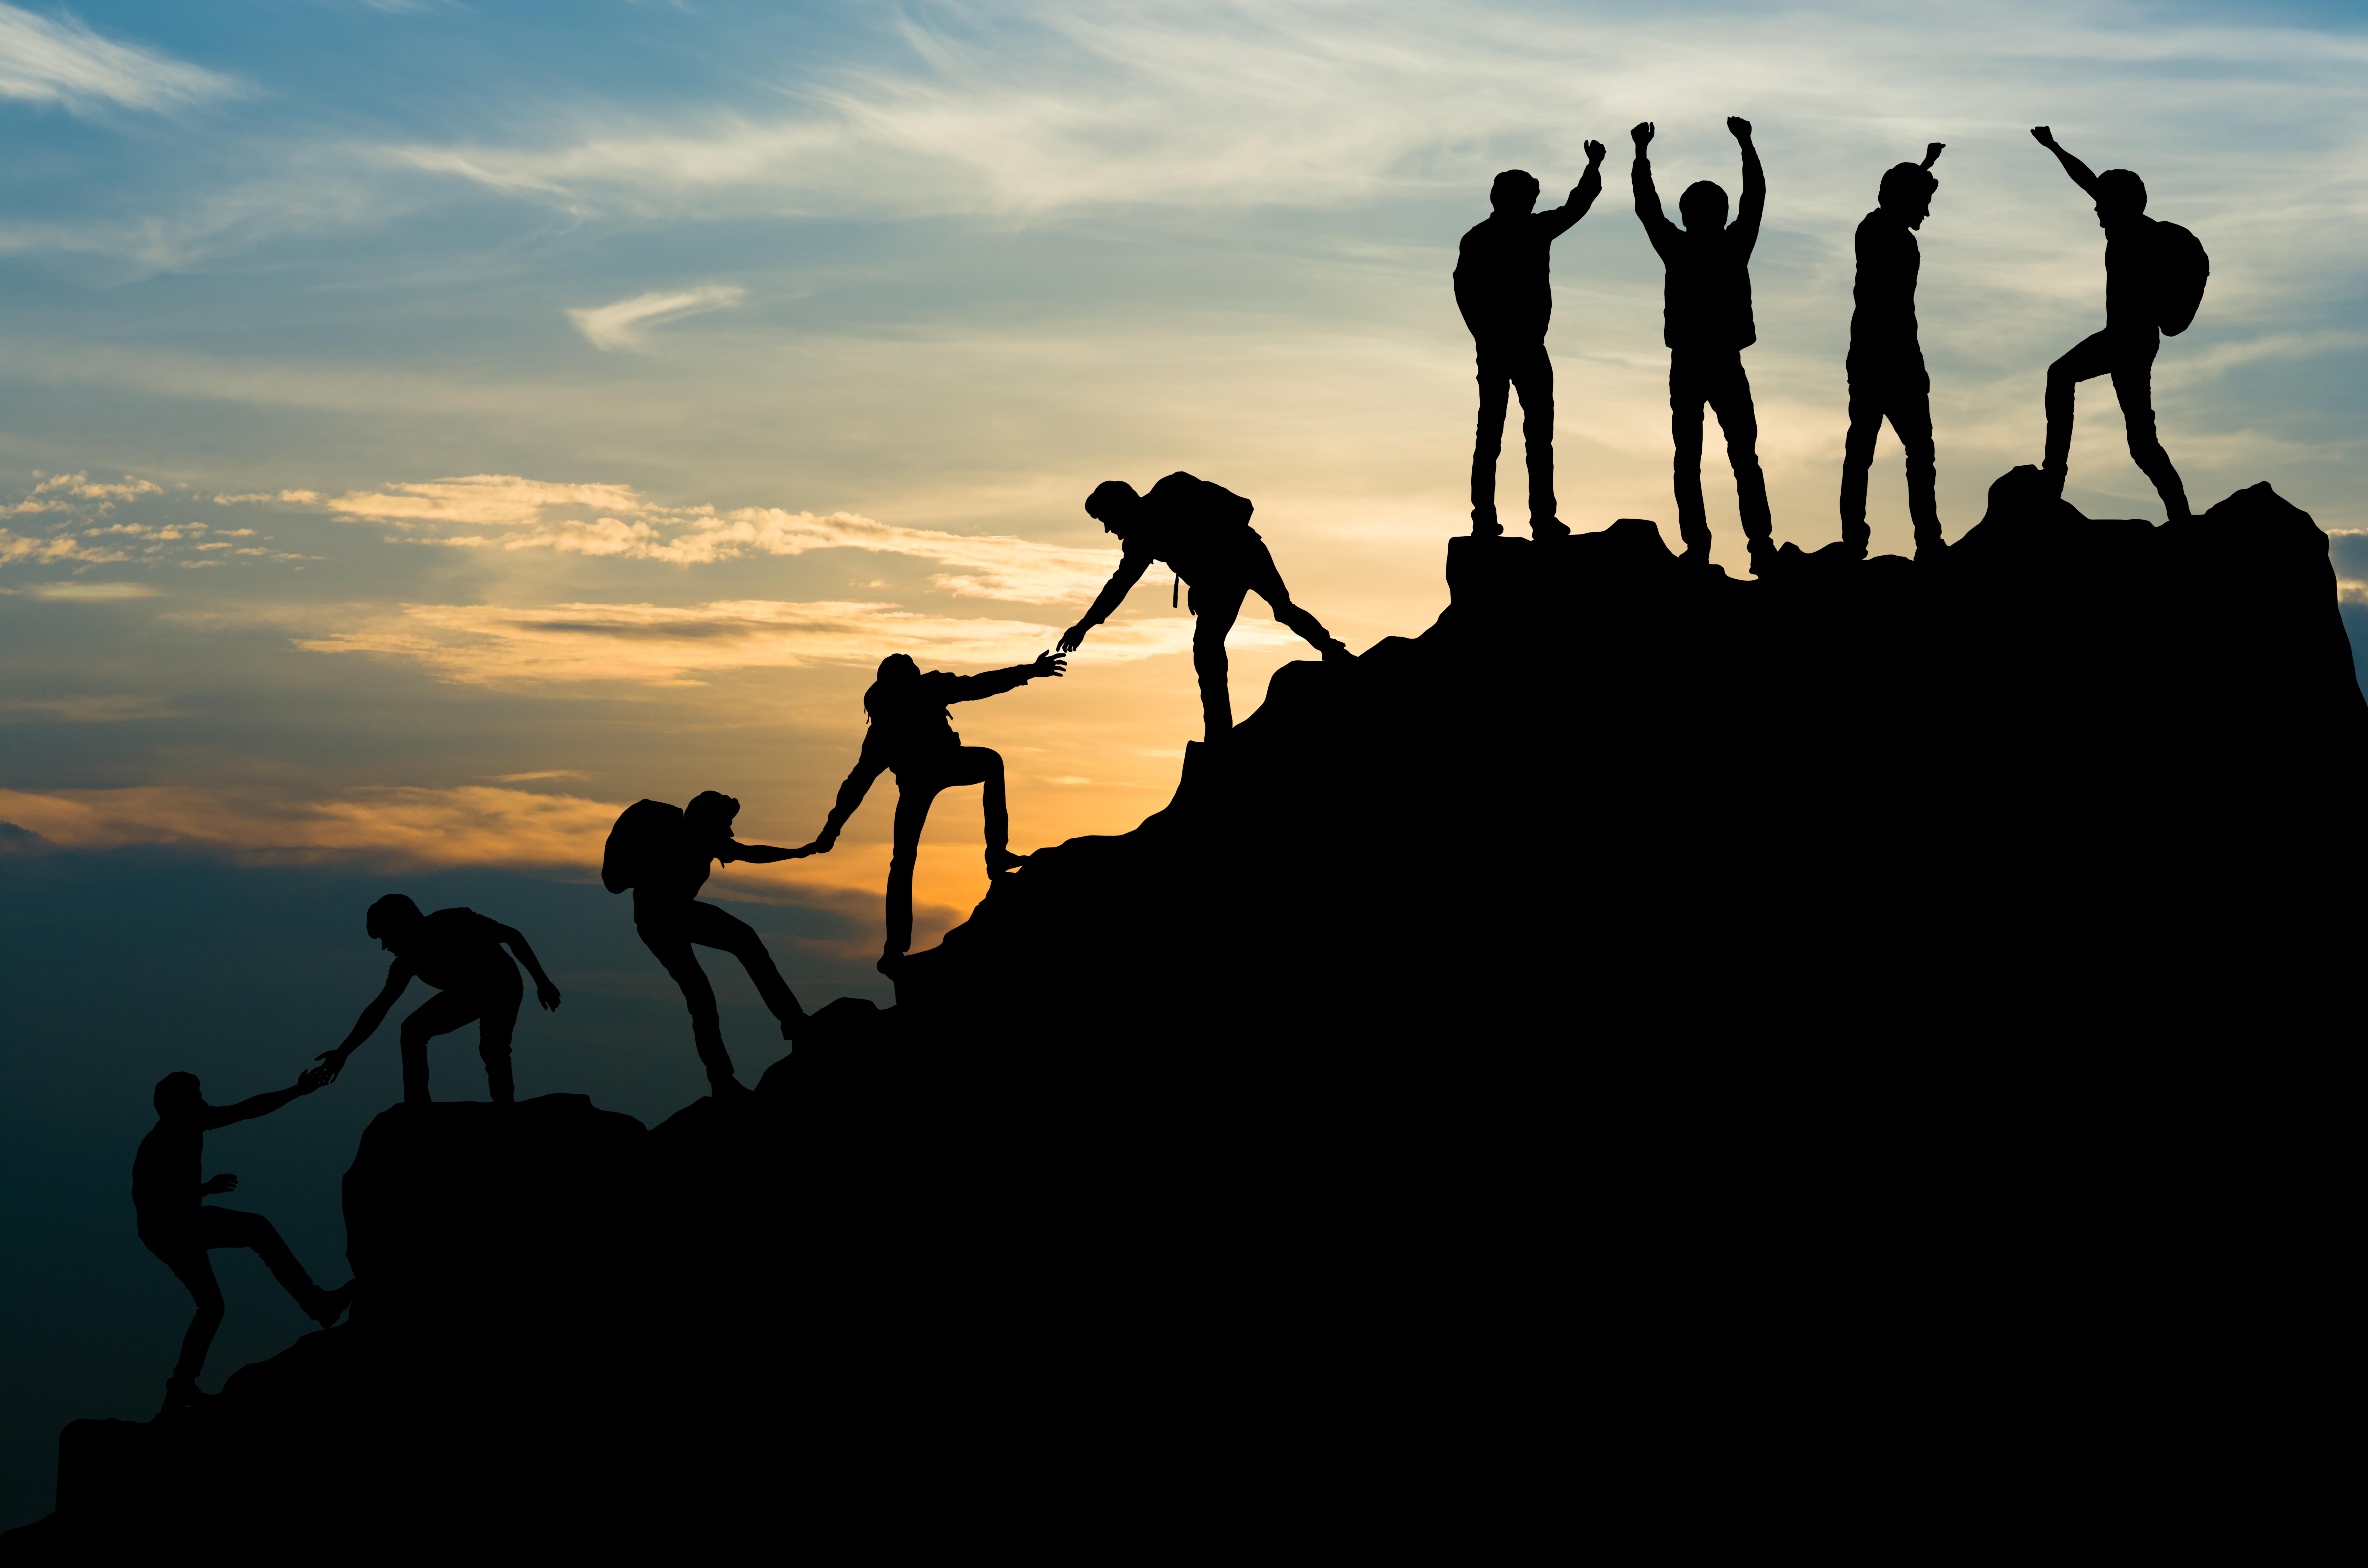 Group climbing up mountain